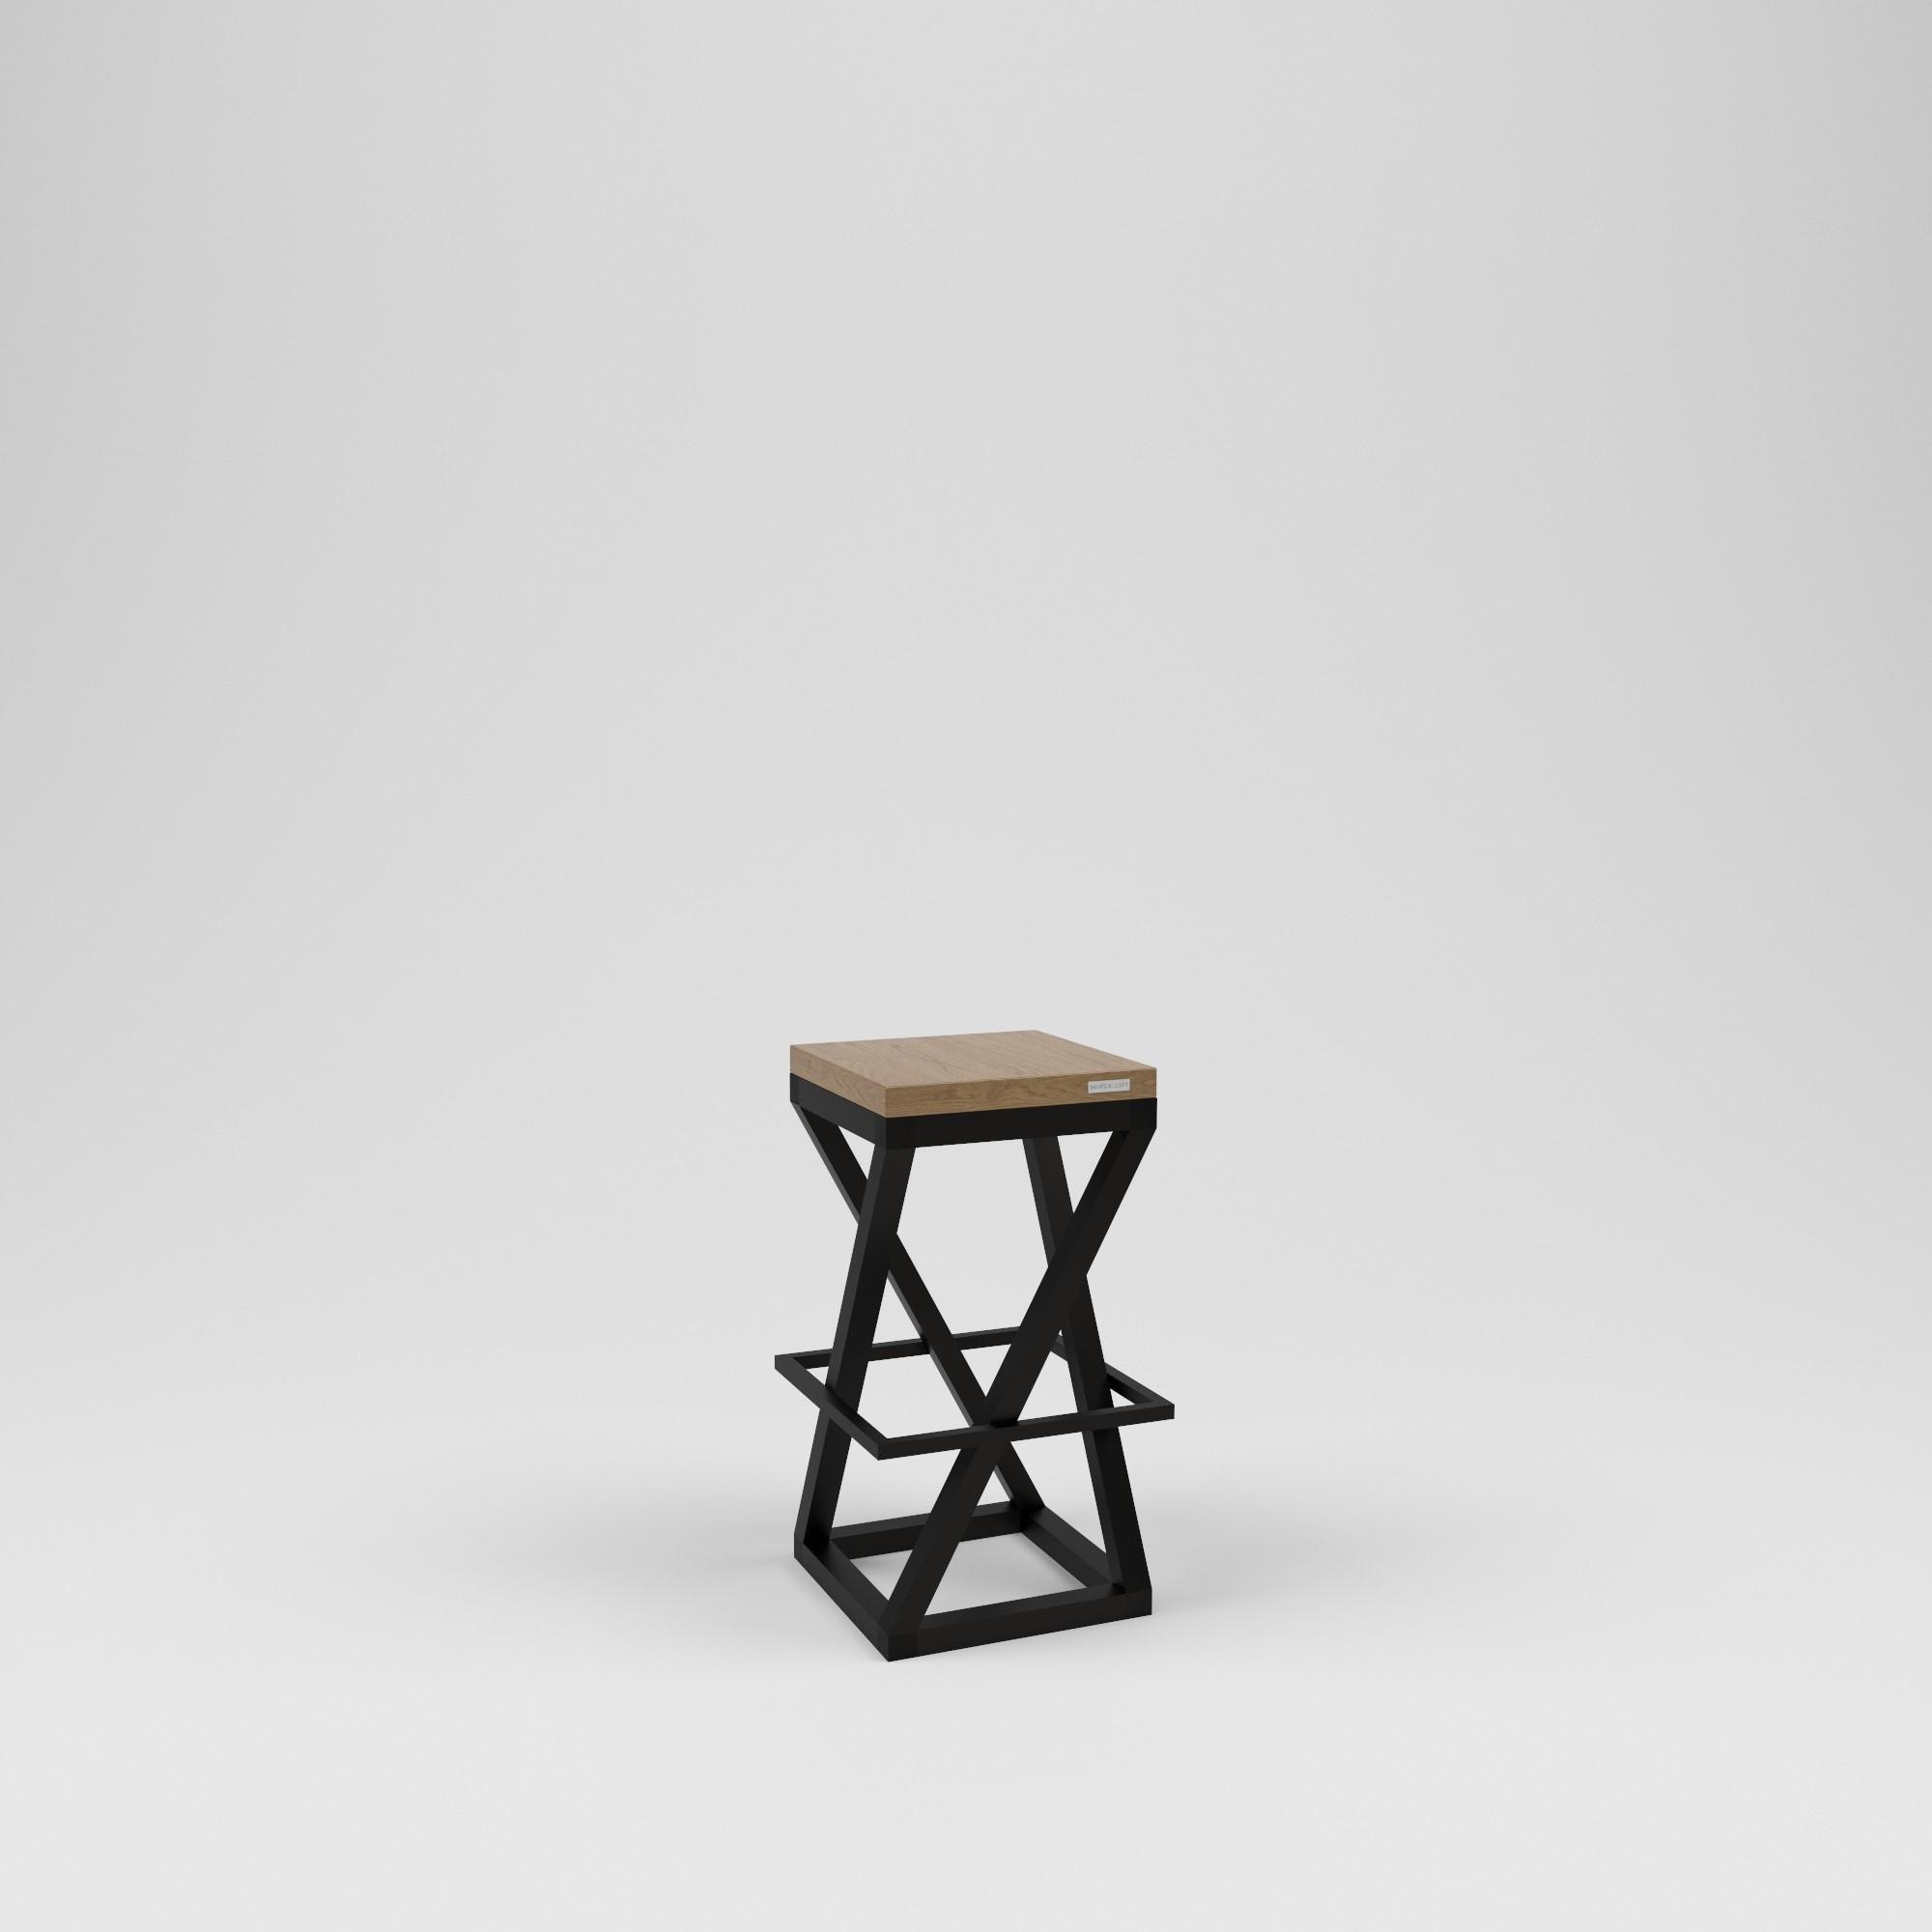 Стул барный лофт (kovka object) черный 38.0x75.0x38.0 см.